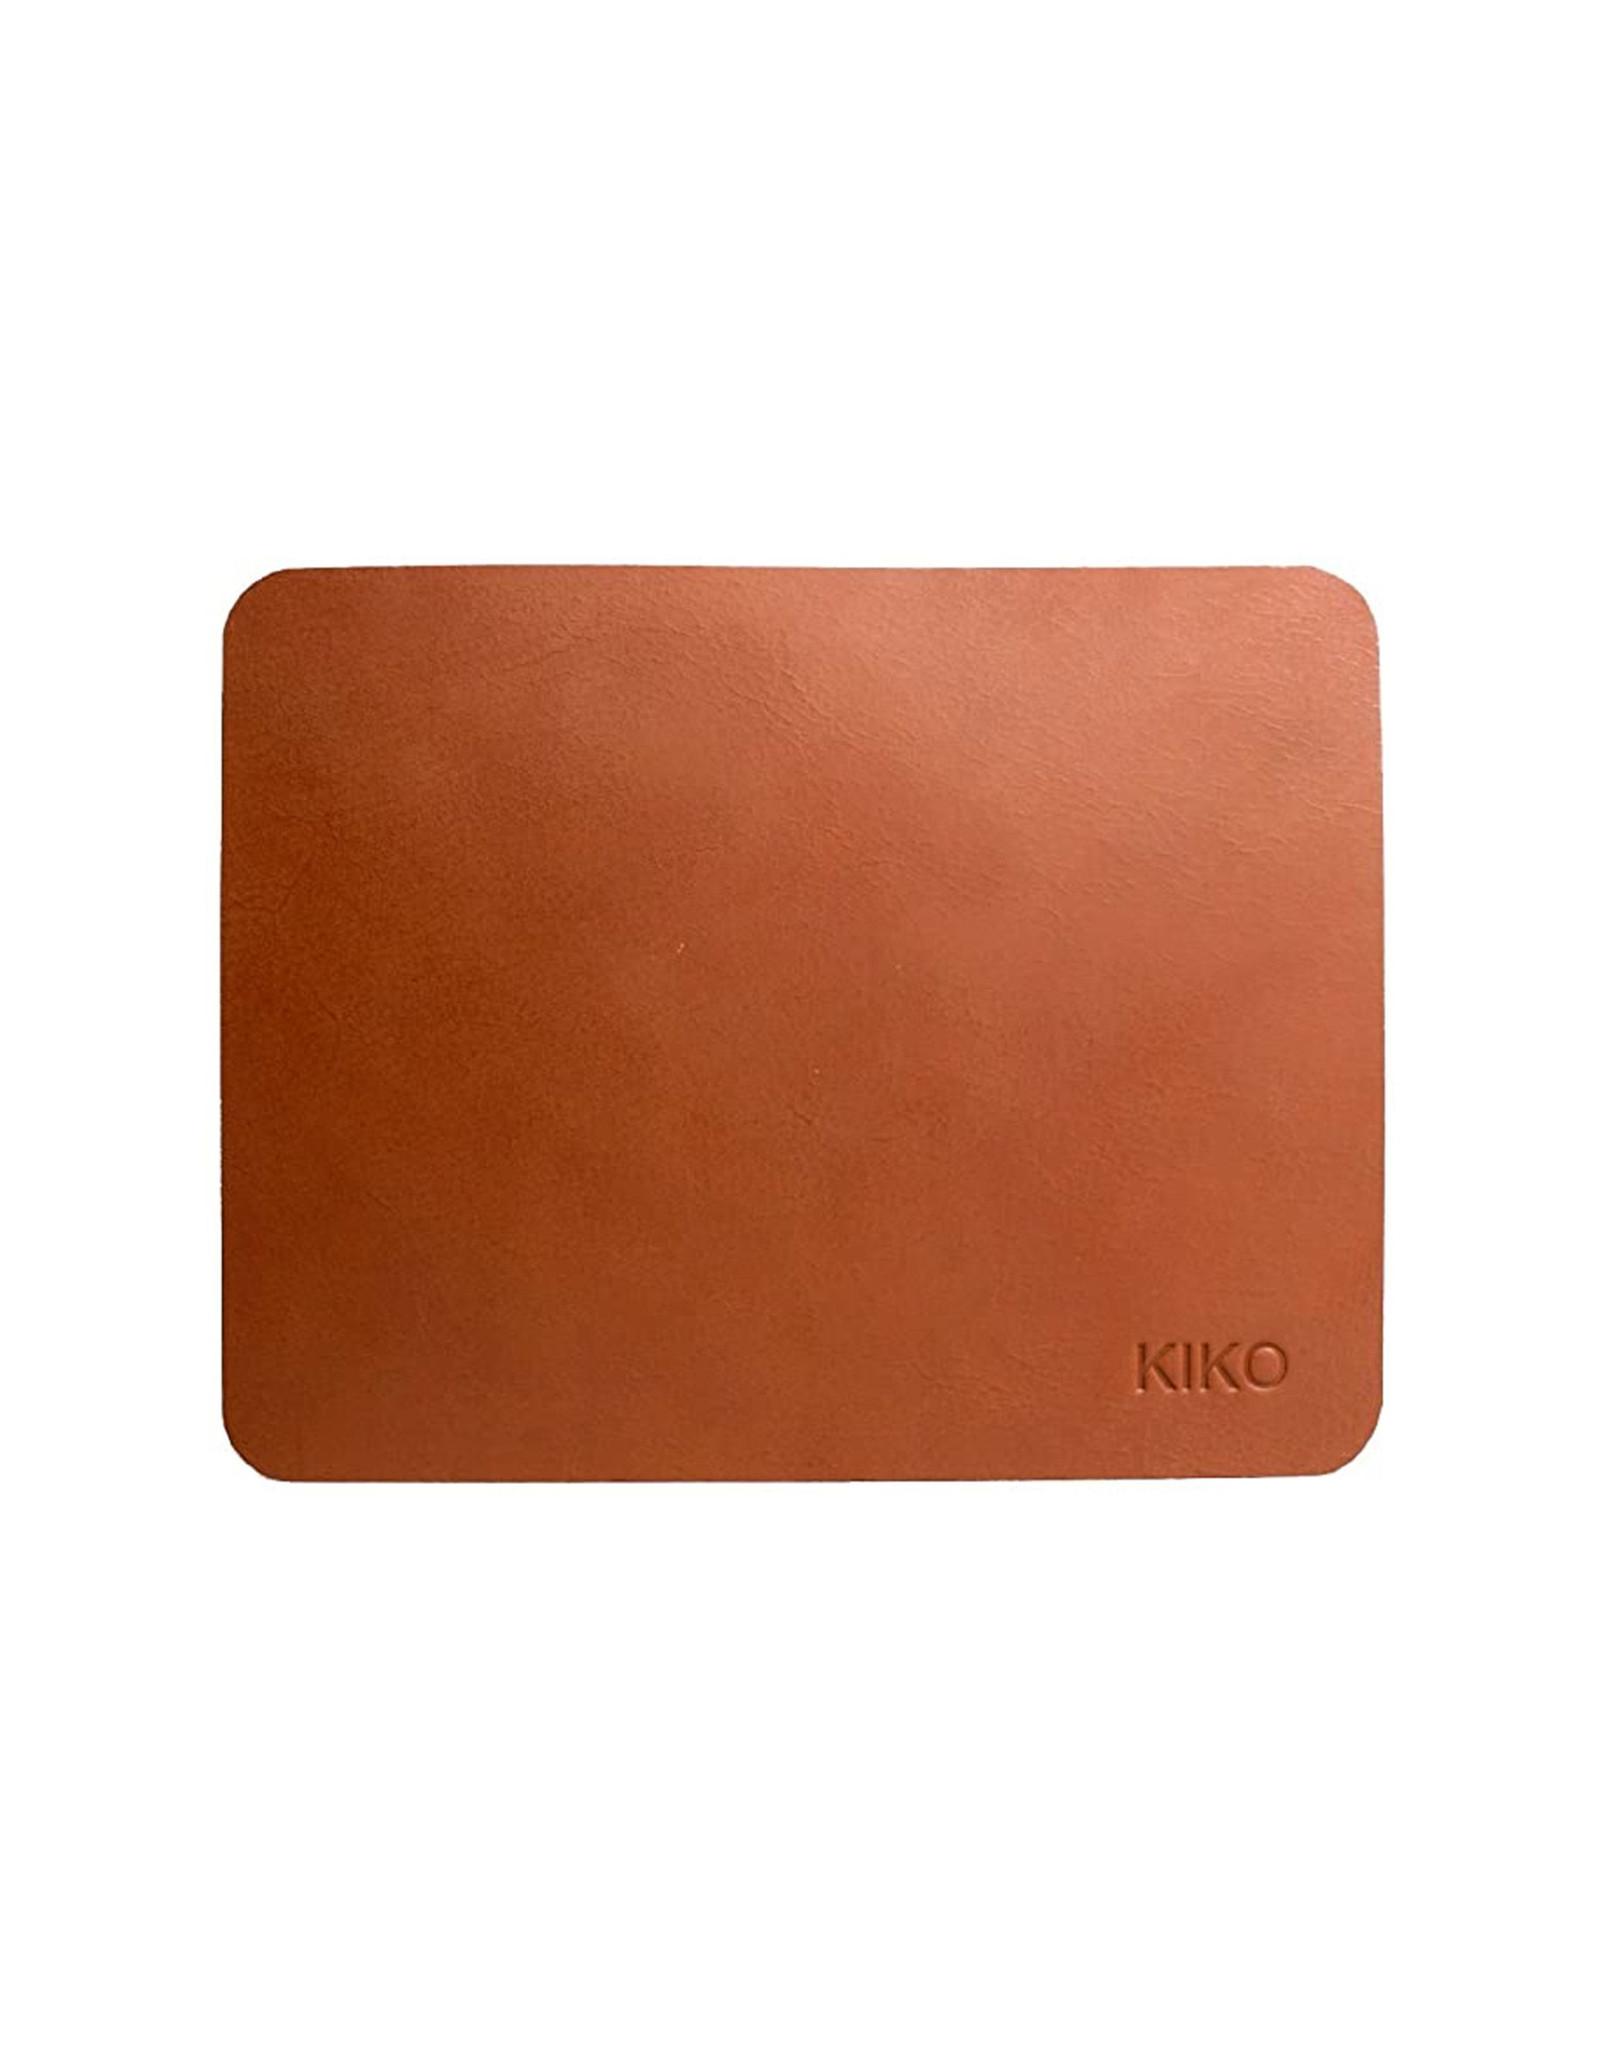 Kiko Leather Mouse Pad Brown